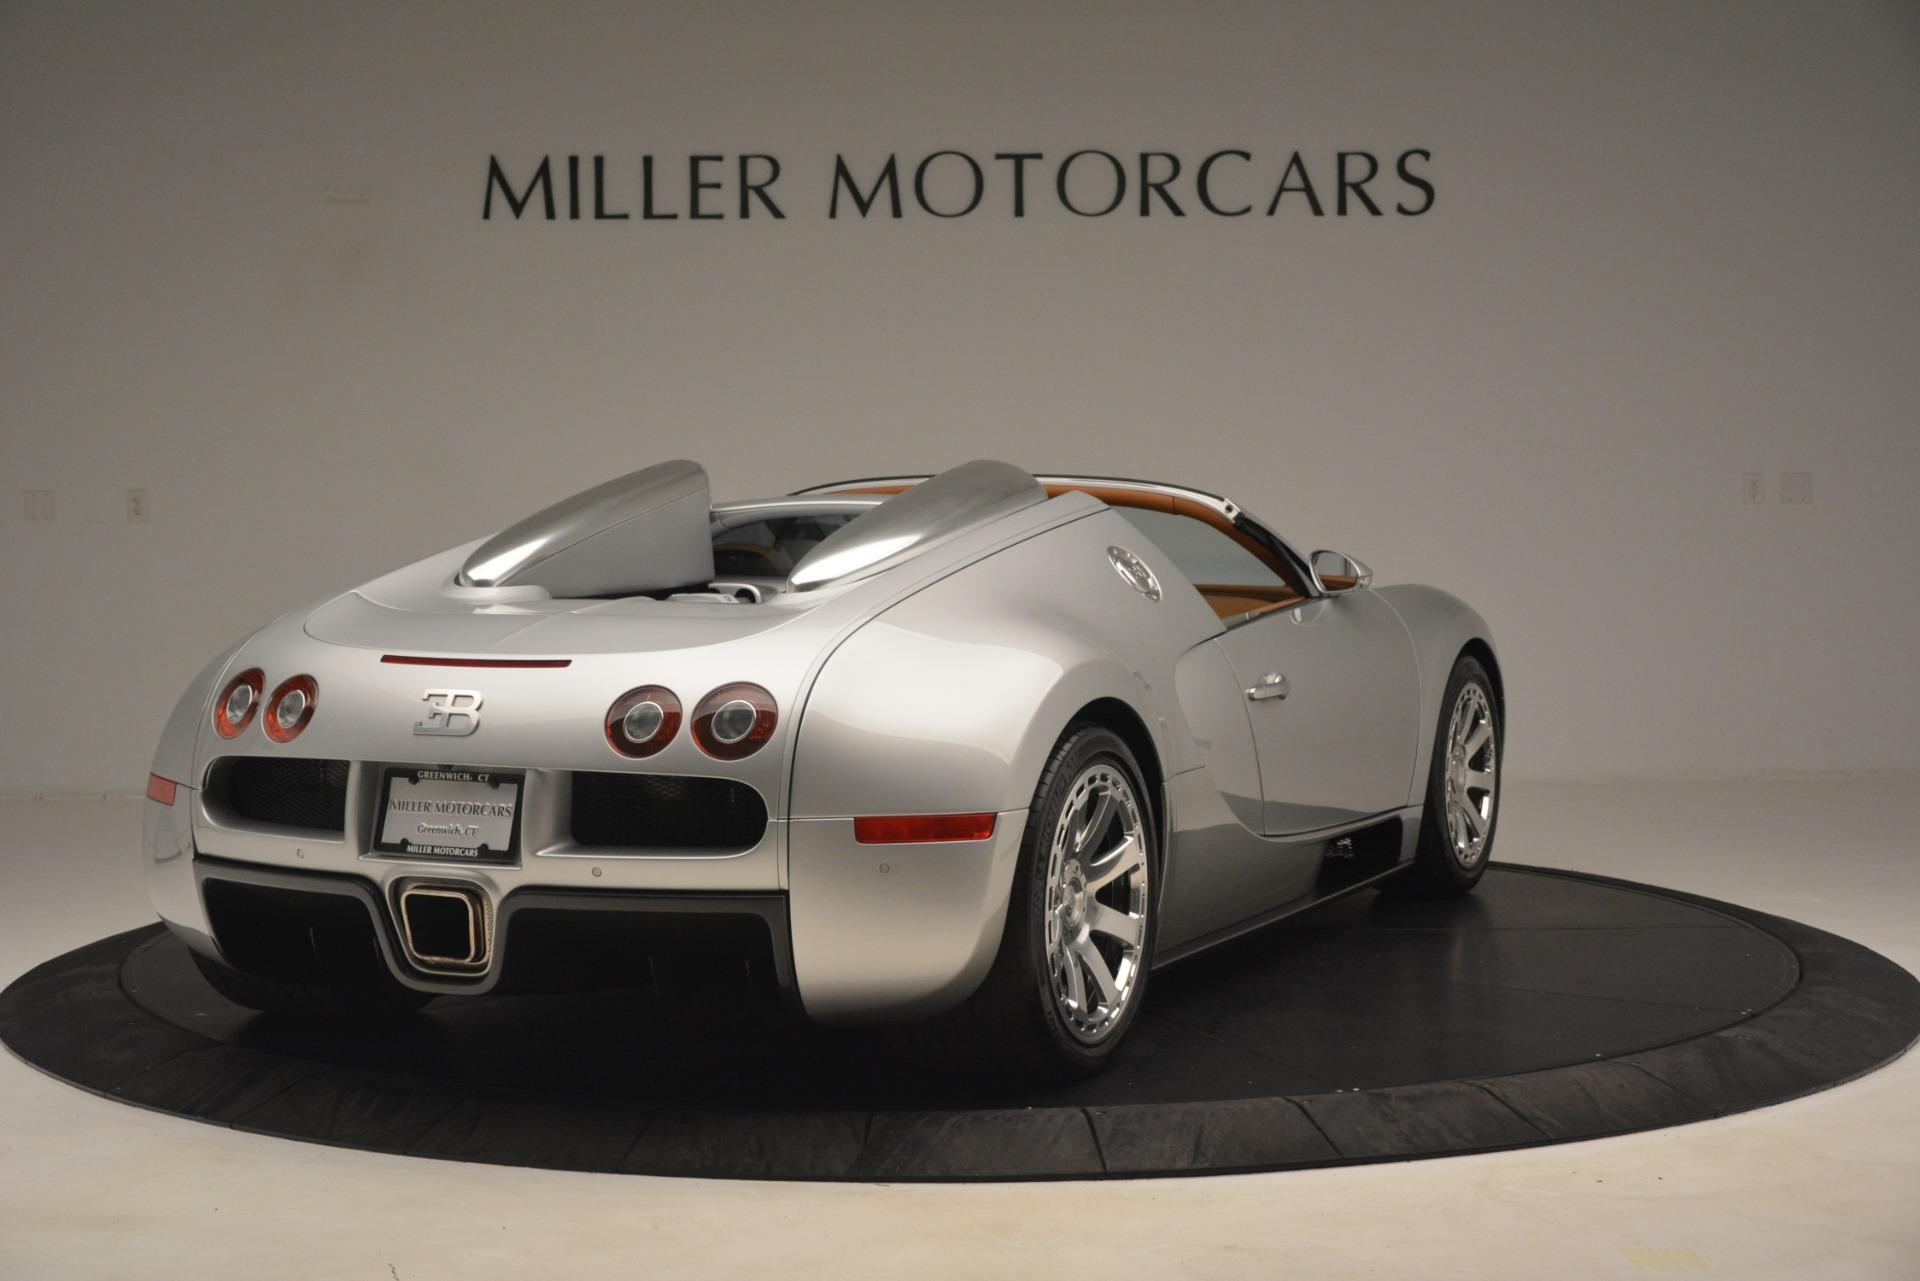 Pre-Owned 2010 Bugatti Veyron 16.4 Grand Sport For Sale ...